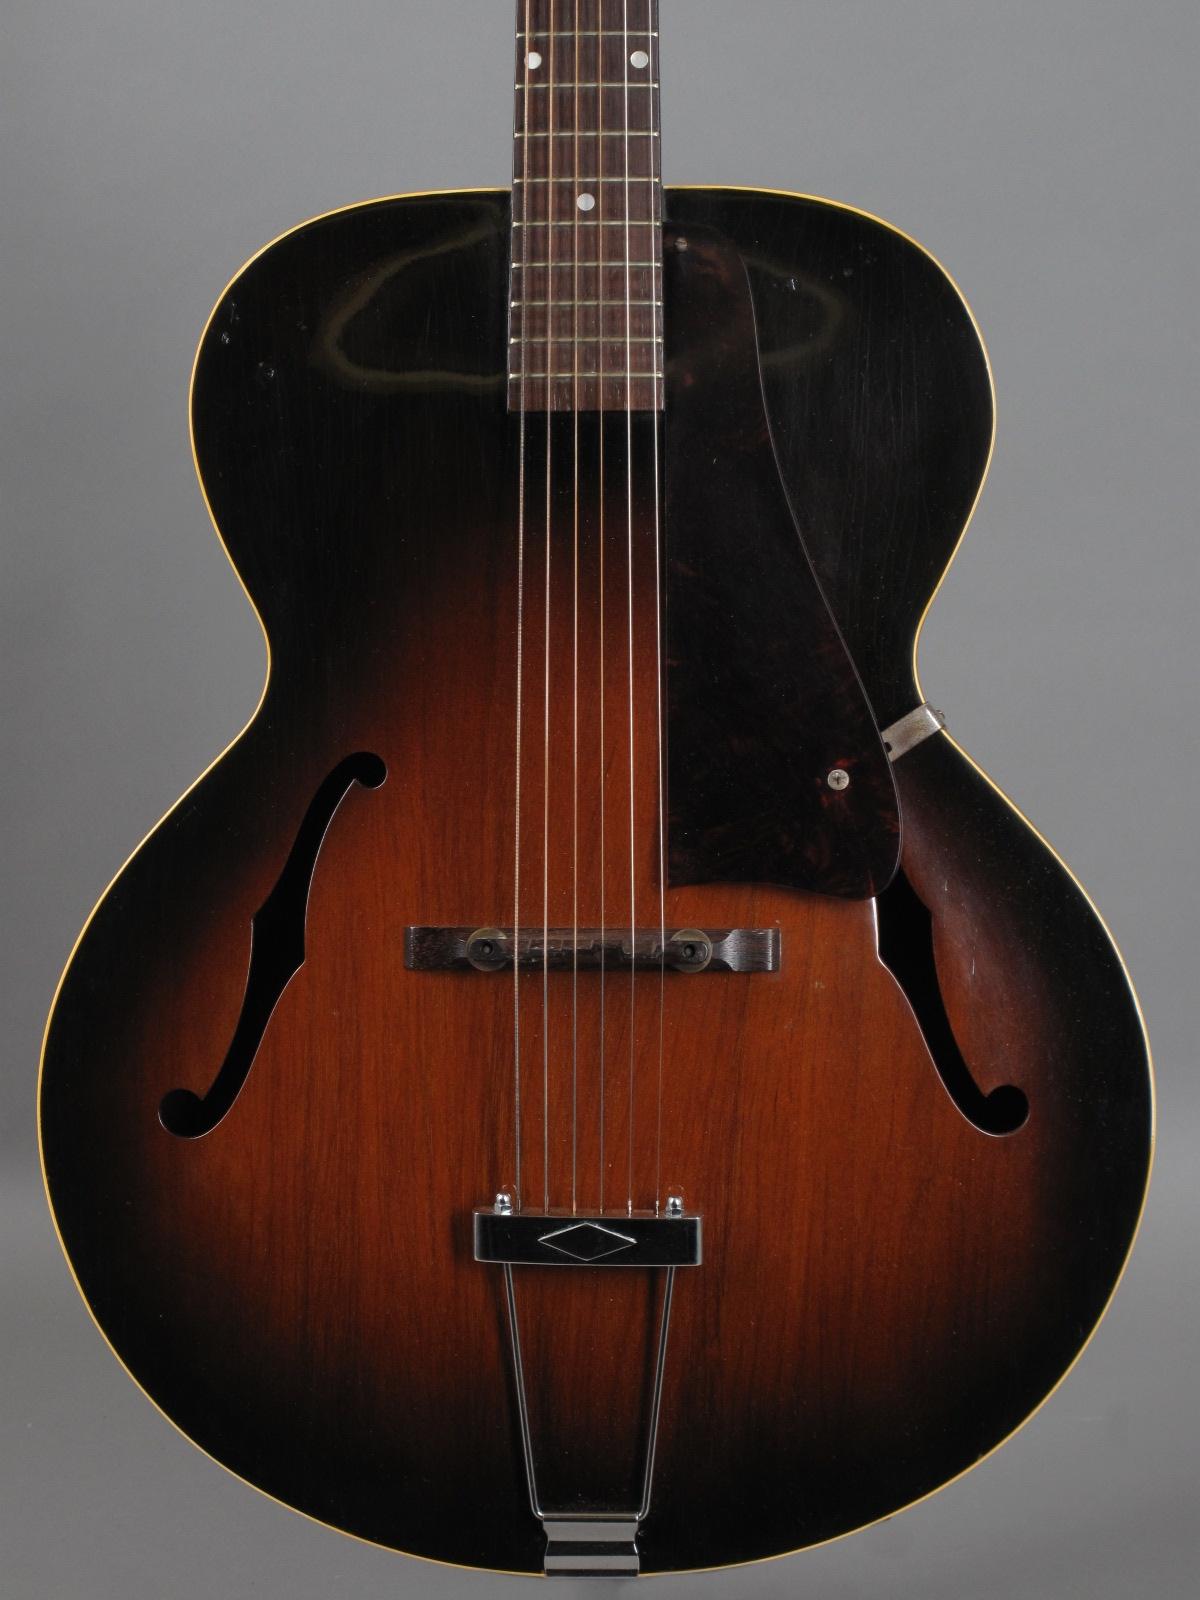 1951 Gibson L-48 - Sunburst